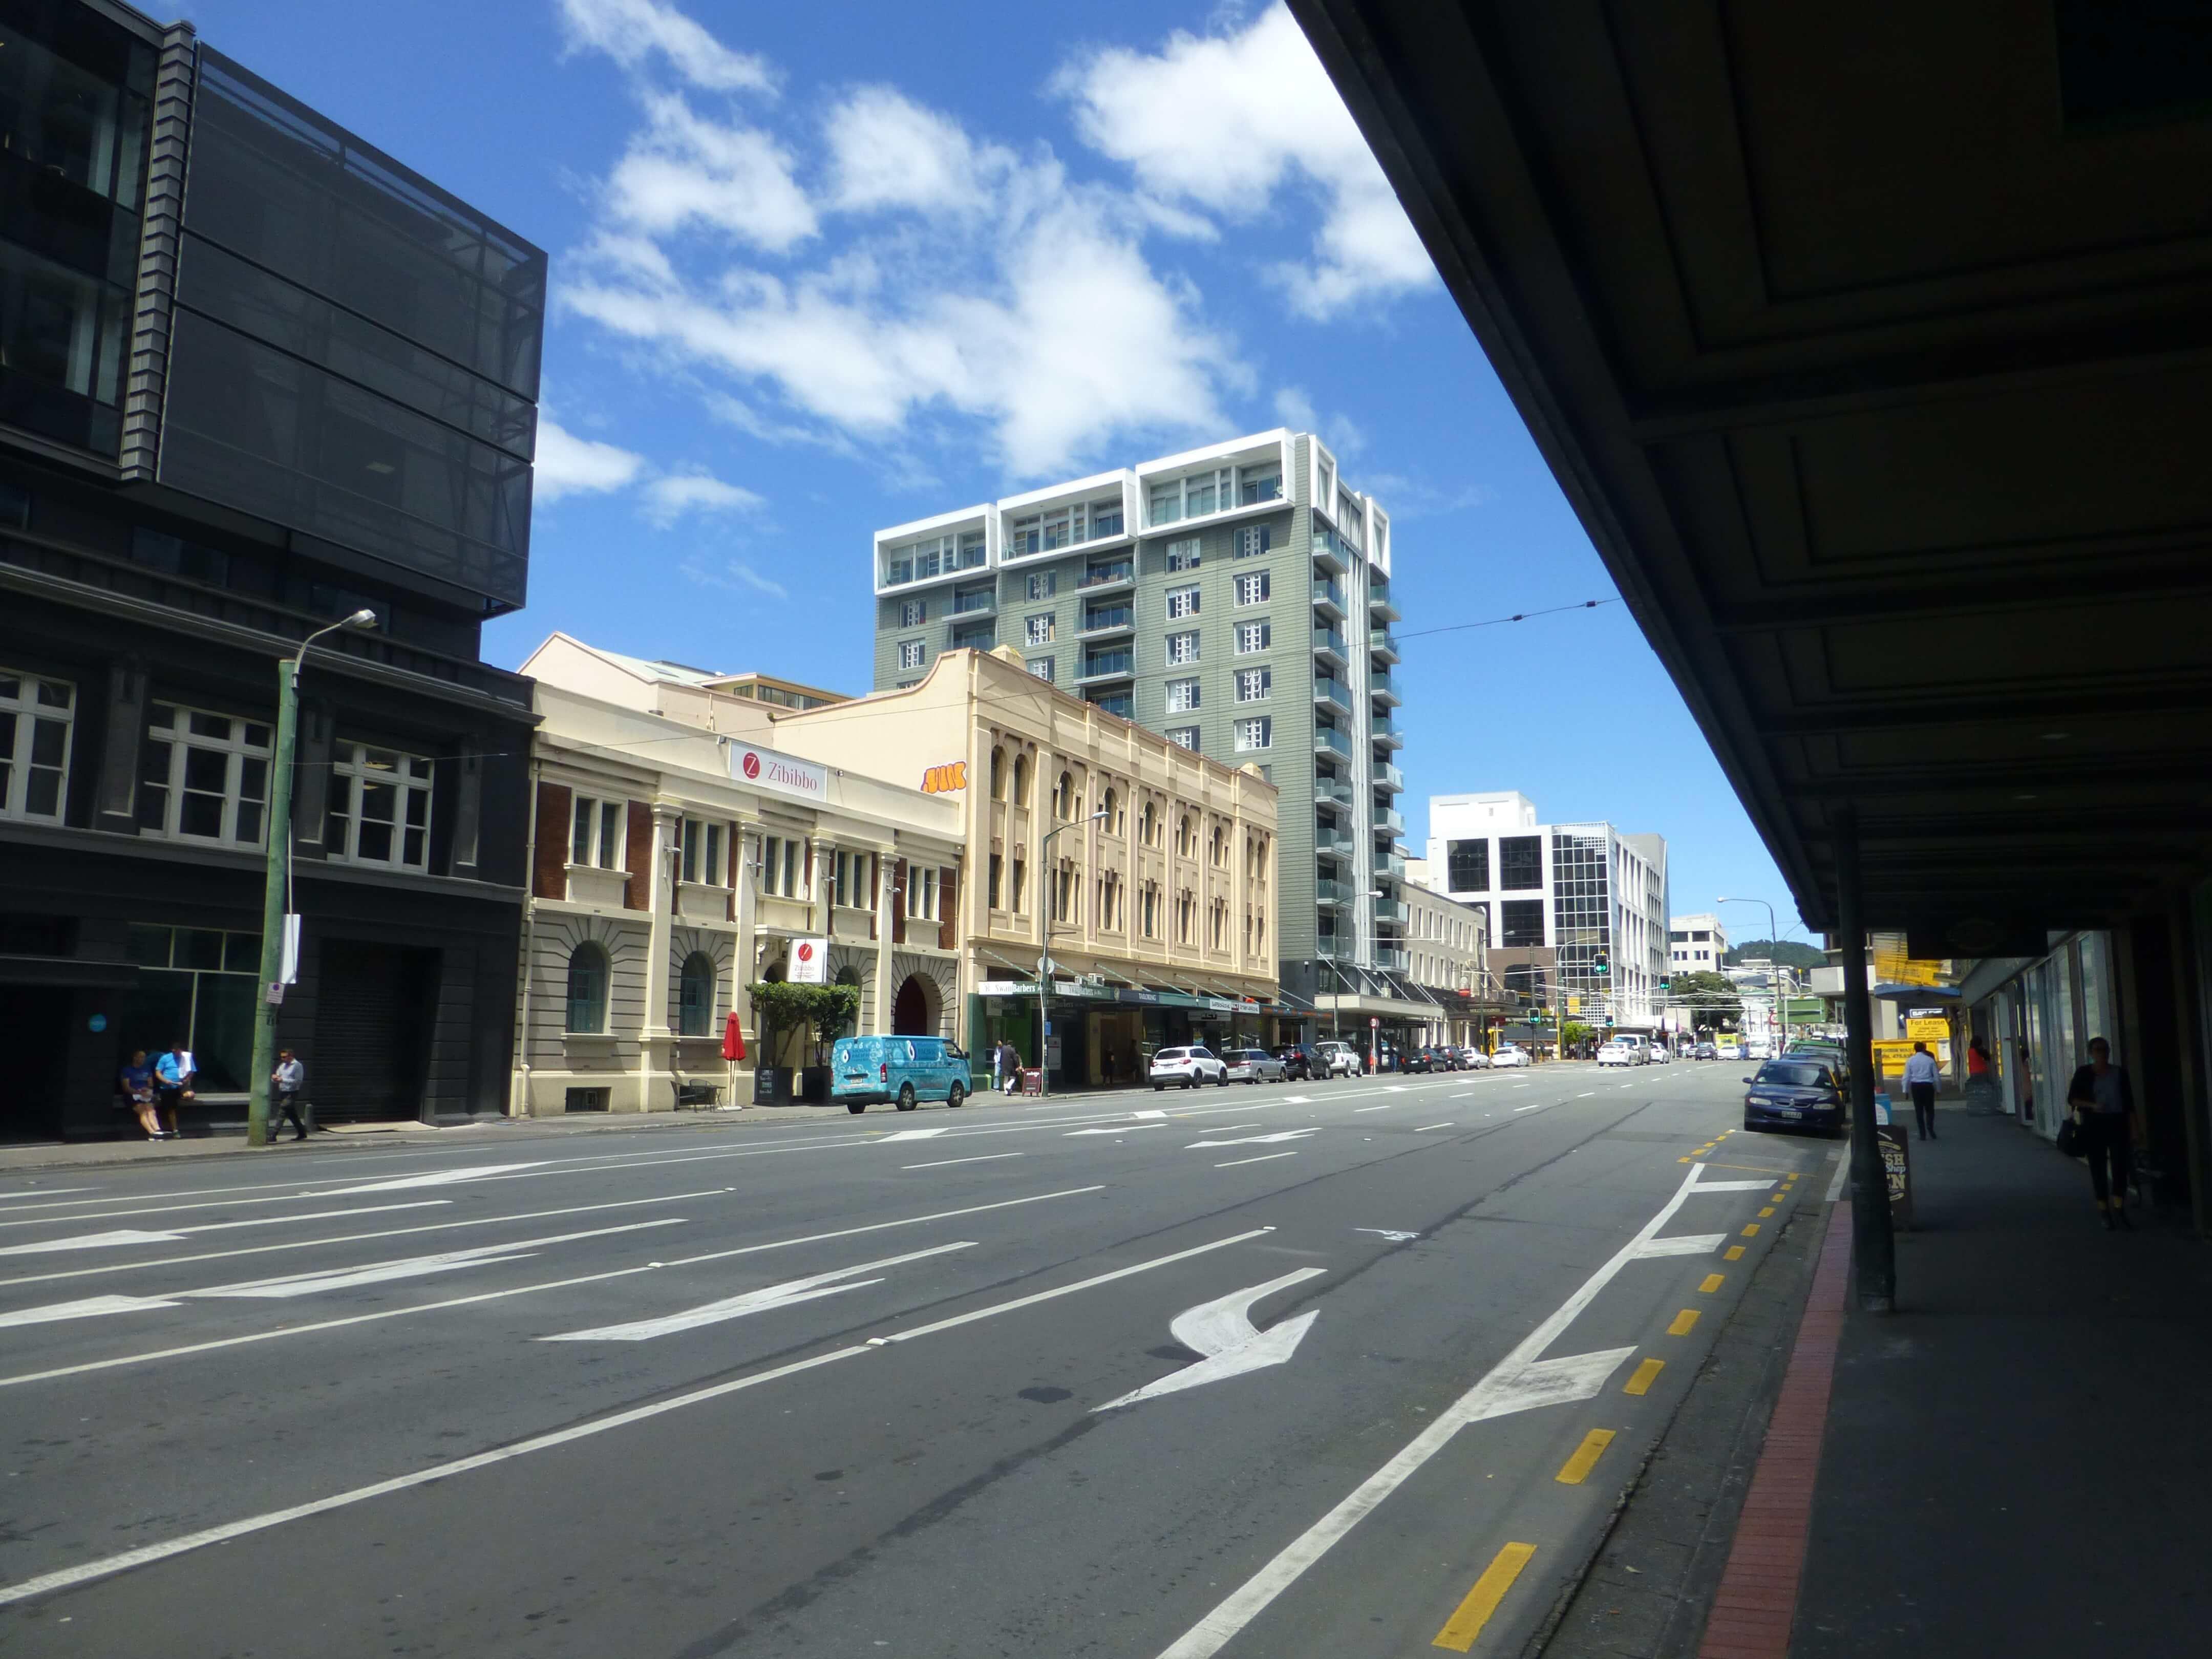 im Zentrum, Wellington, Neuseeland, Weit-weg.reisen 13